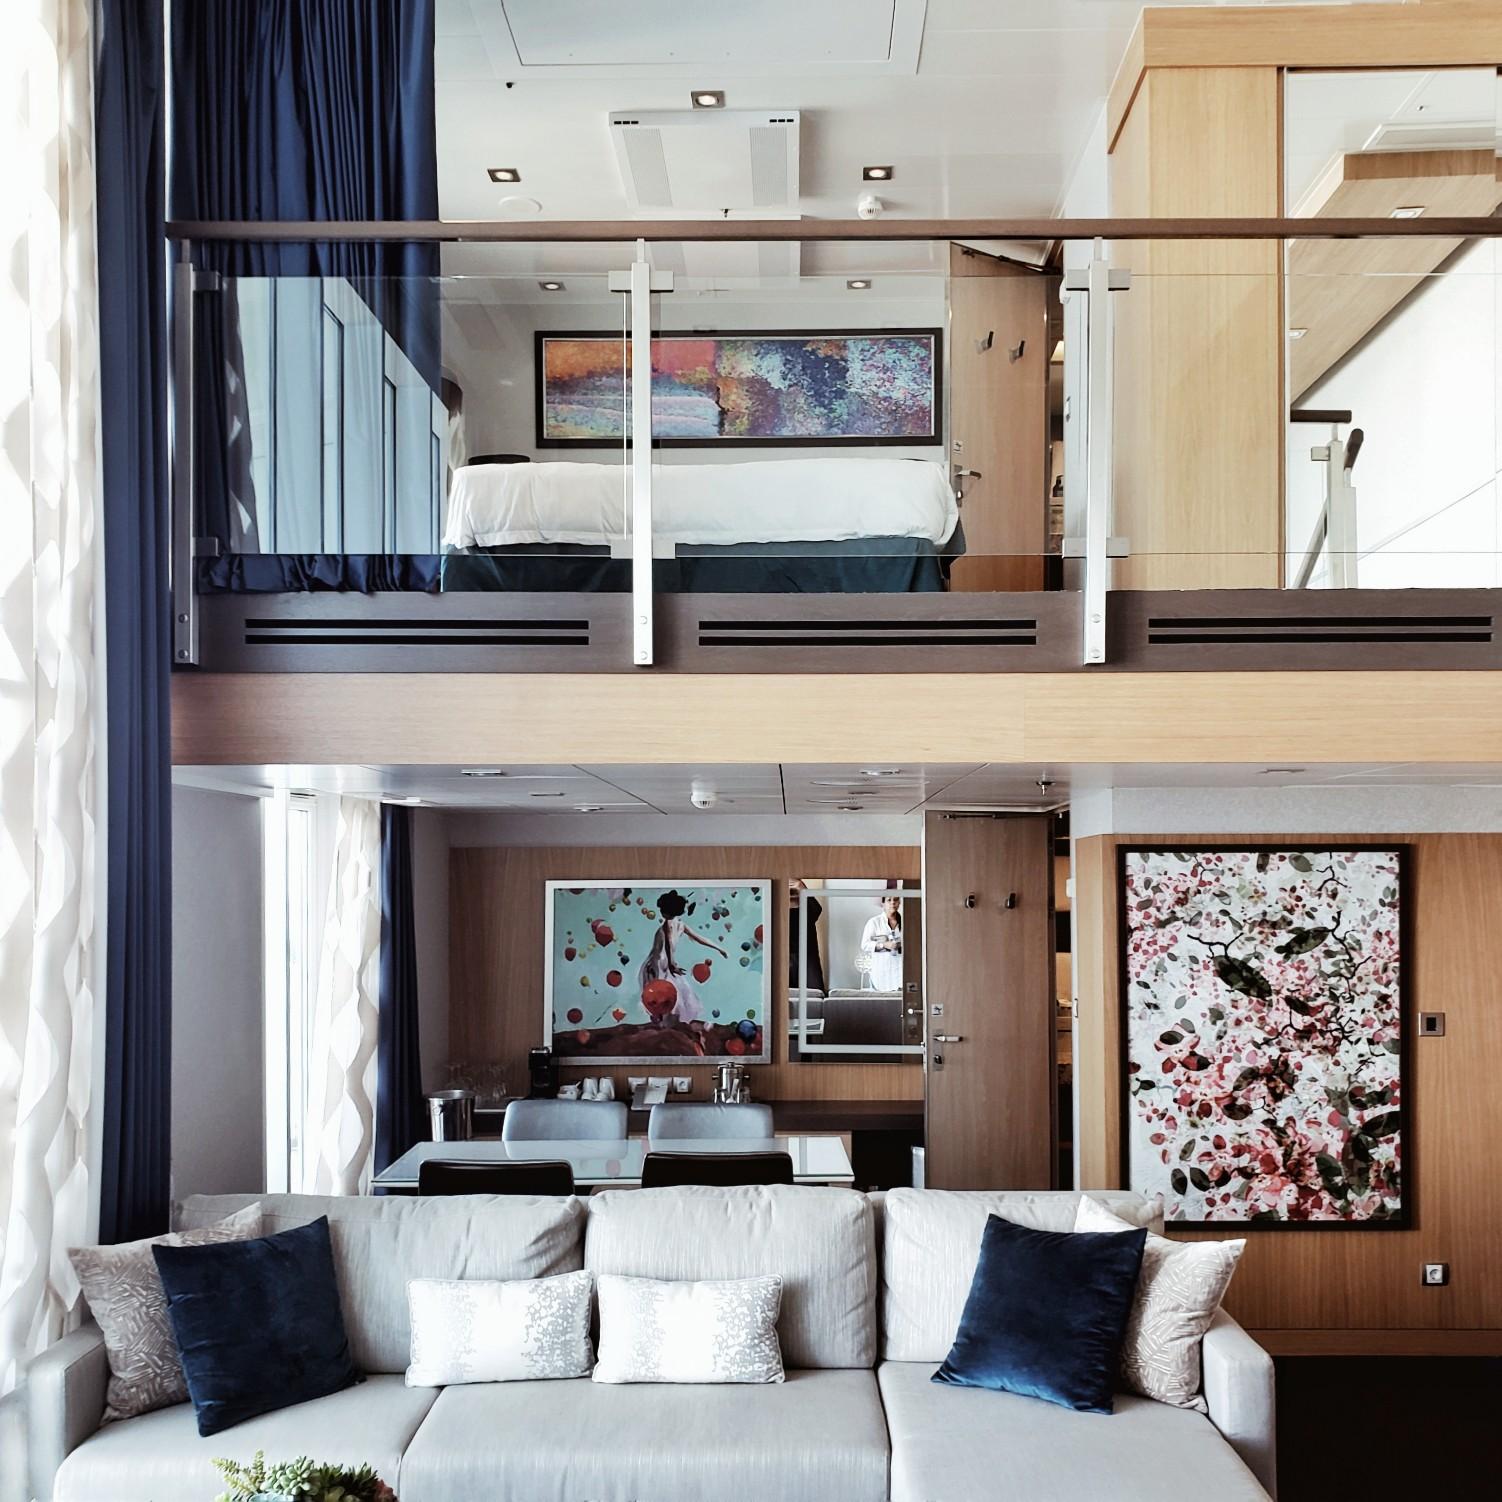 Royal Caribbean Symphony of the Seas Chic Star Loft Suite